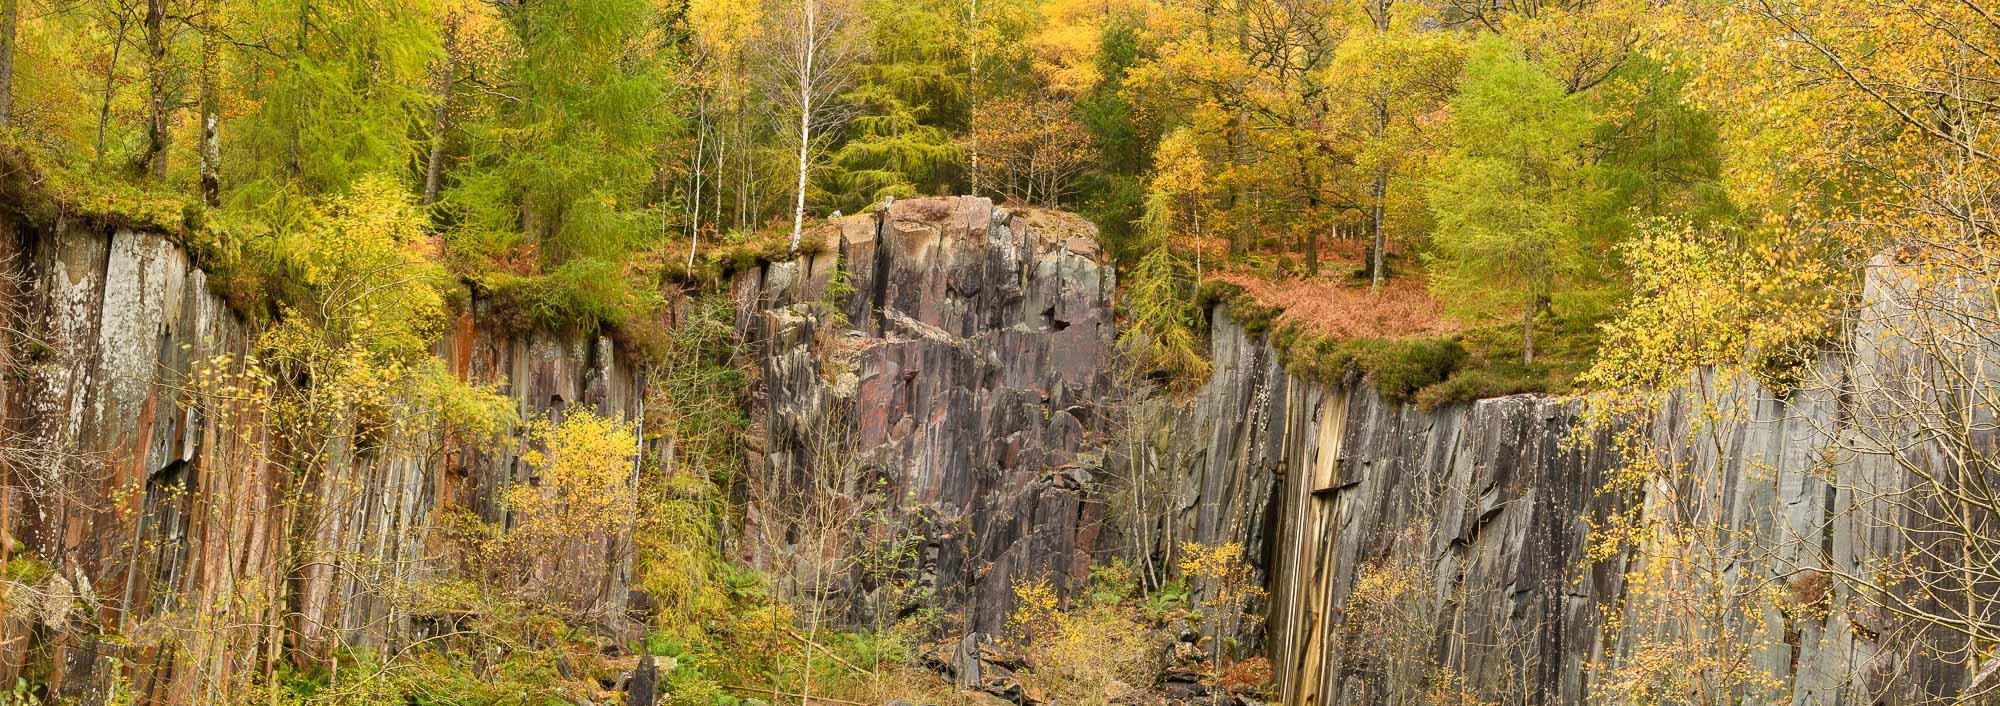 Quarry Pano.jpg